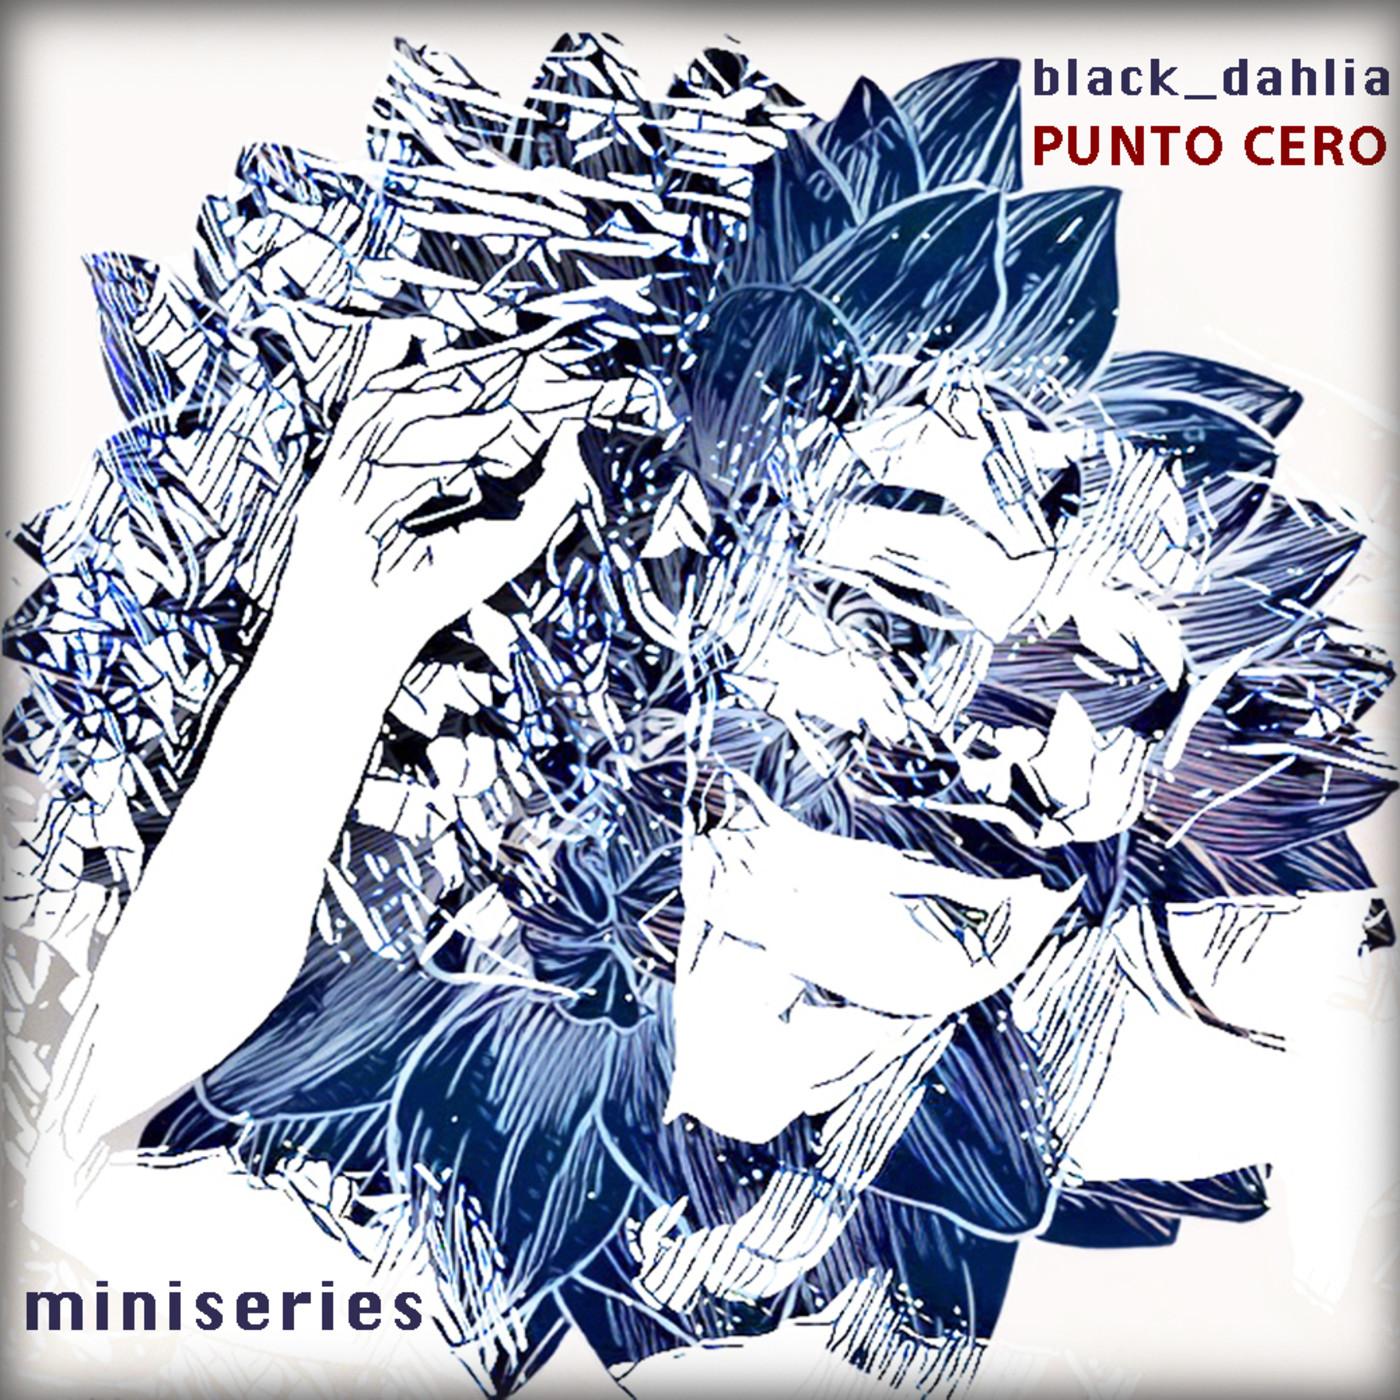 Miniseries Black Dahlia Punto Cero2: Entre Sombras y Carmín (La Dalia Negra)